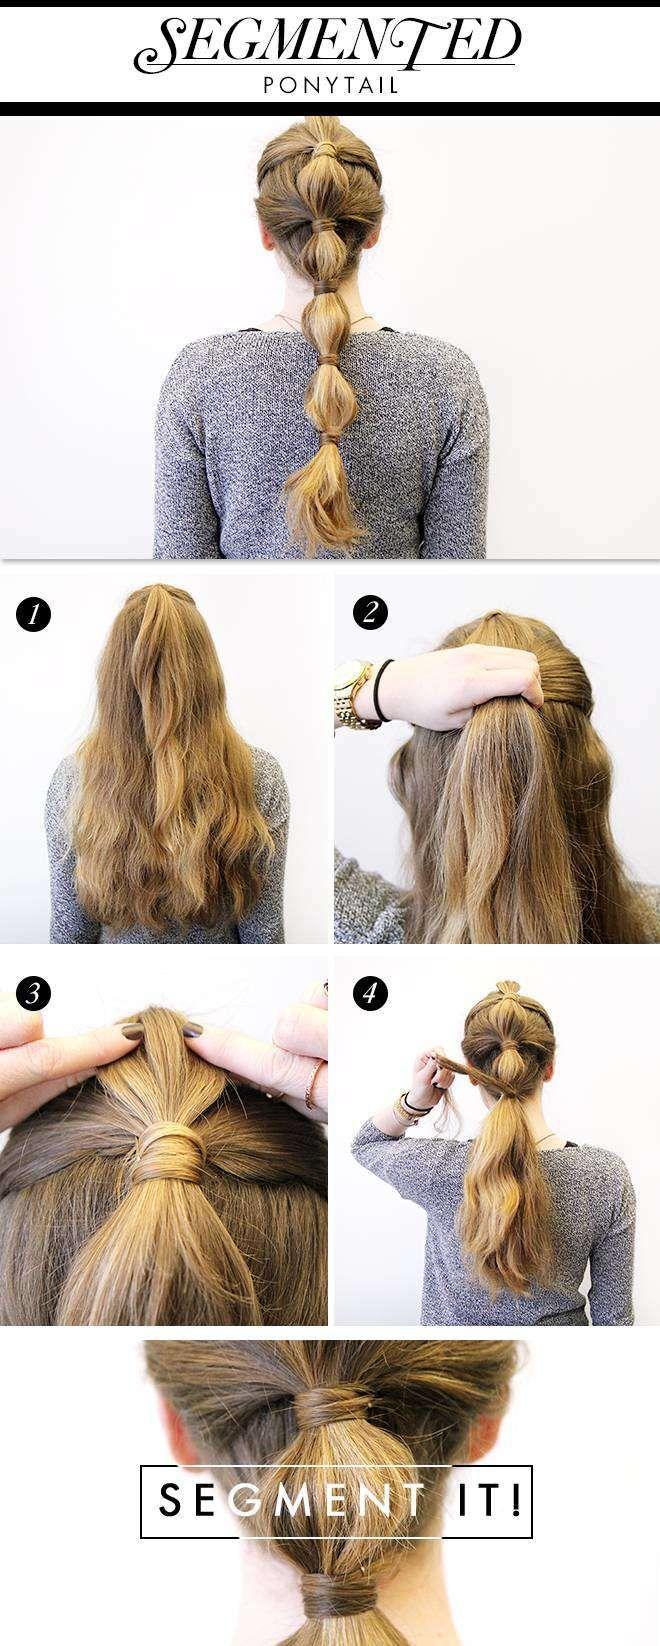 Segmented bubble ponytail Ponytail hairstyles tutorial